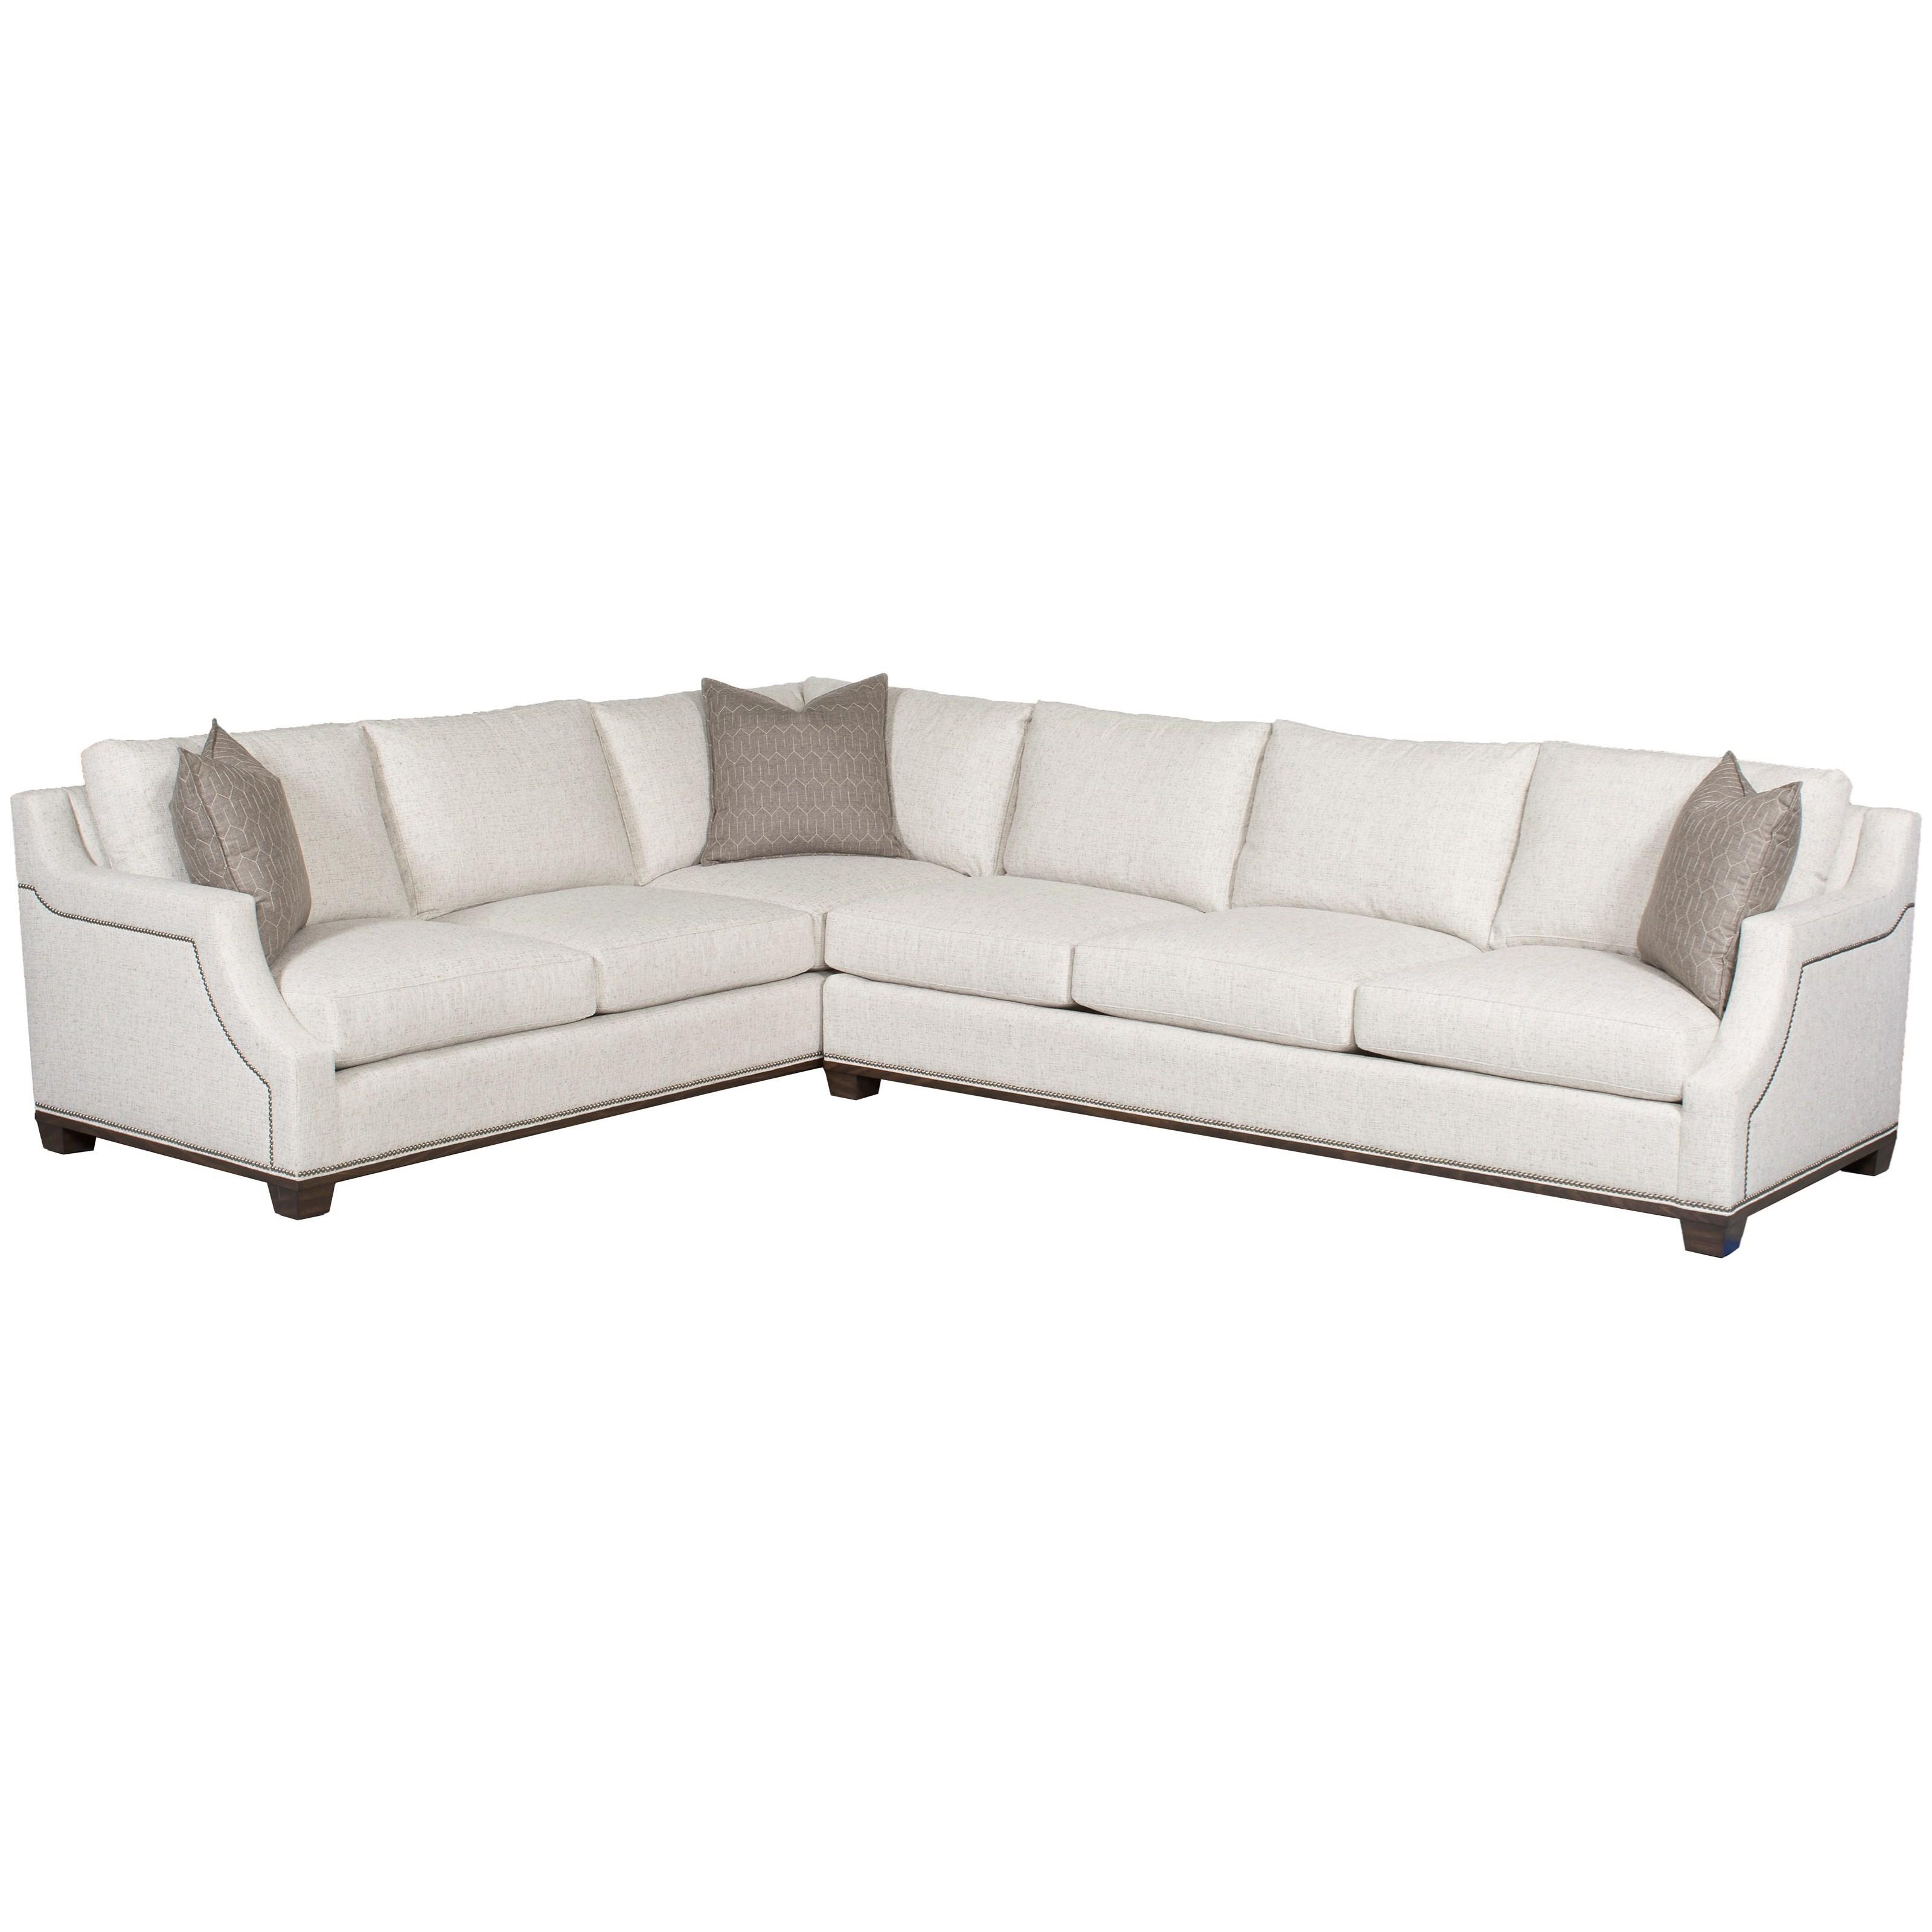 Vanguard Furniture Michael Weiss